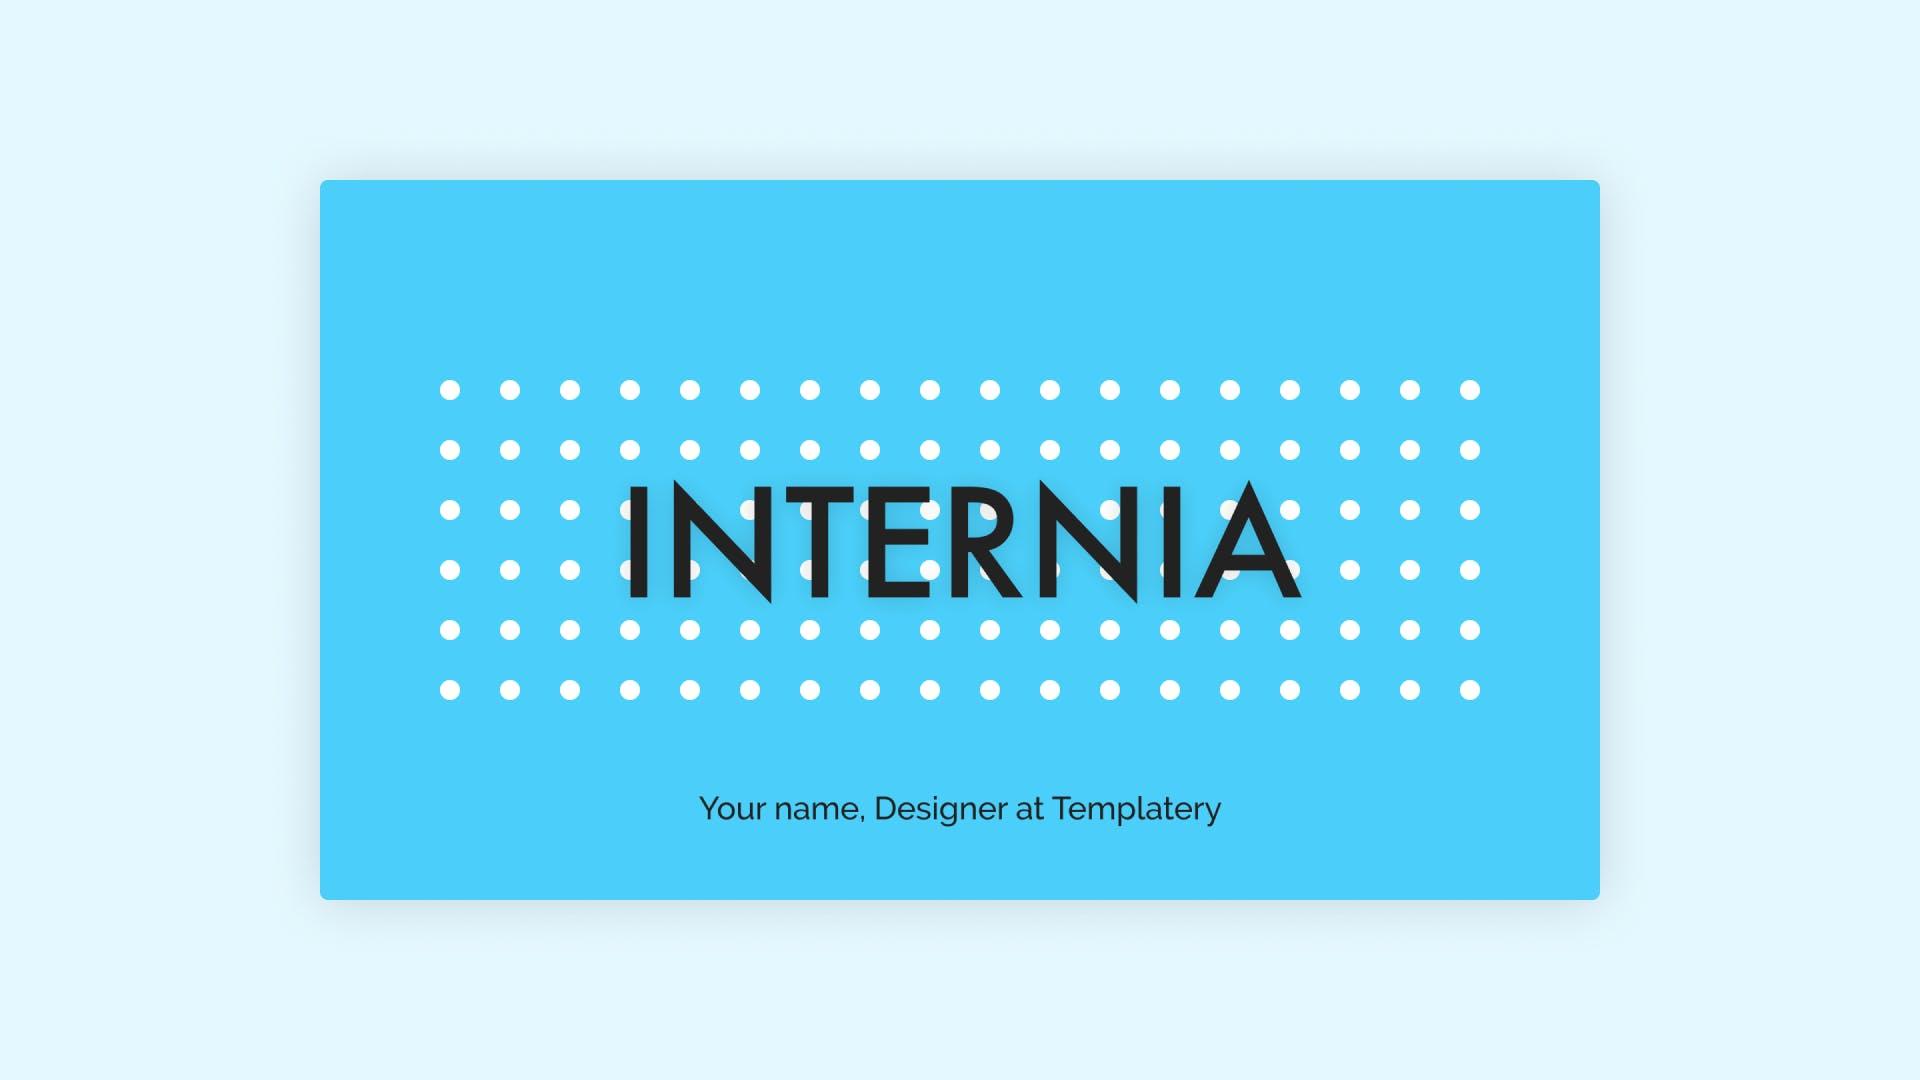 Internia Presentation Template